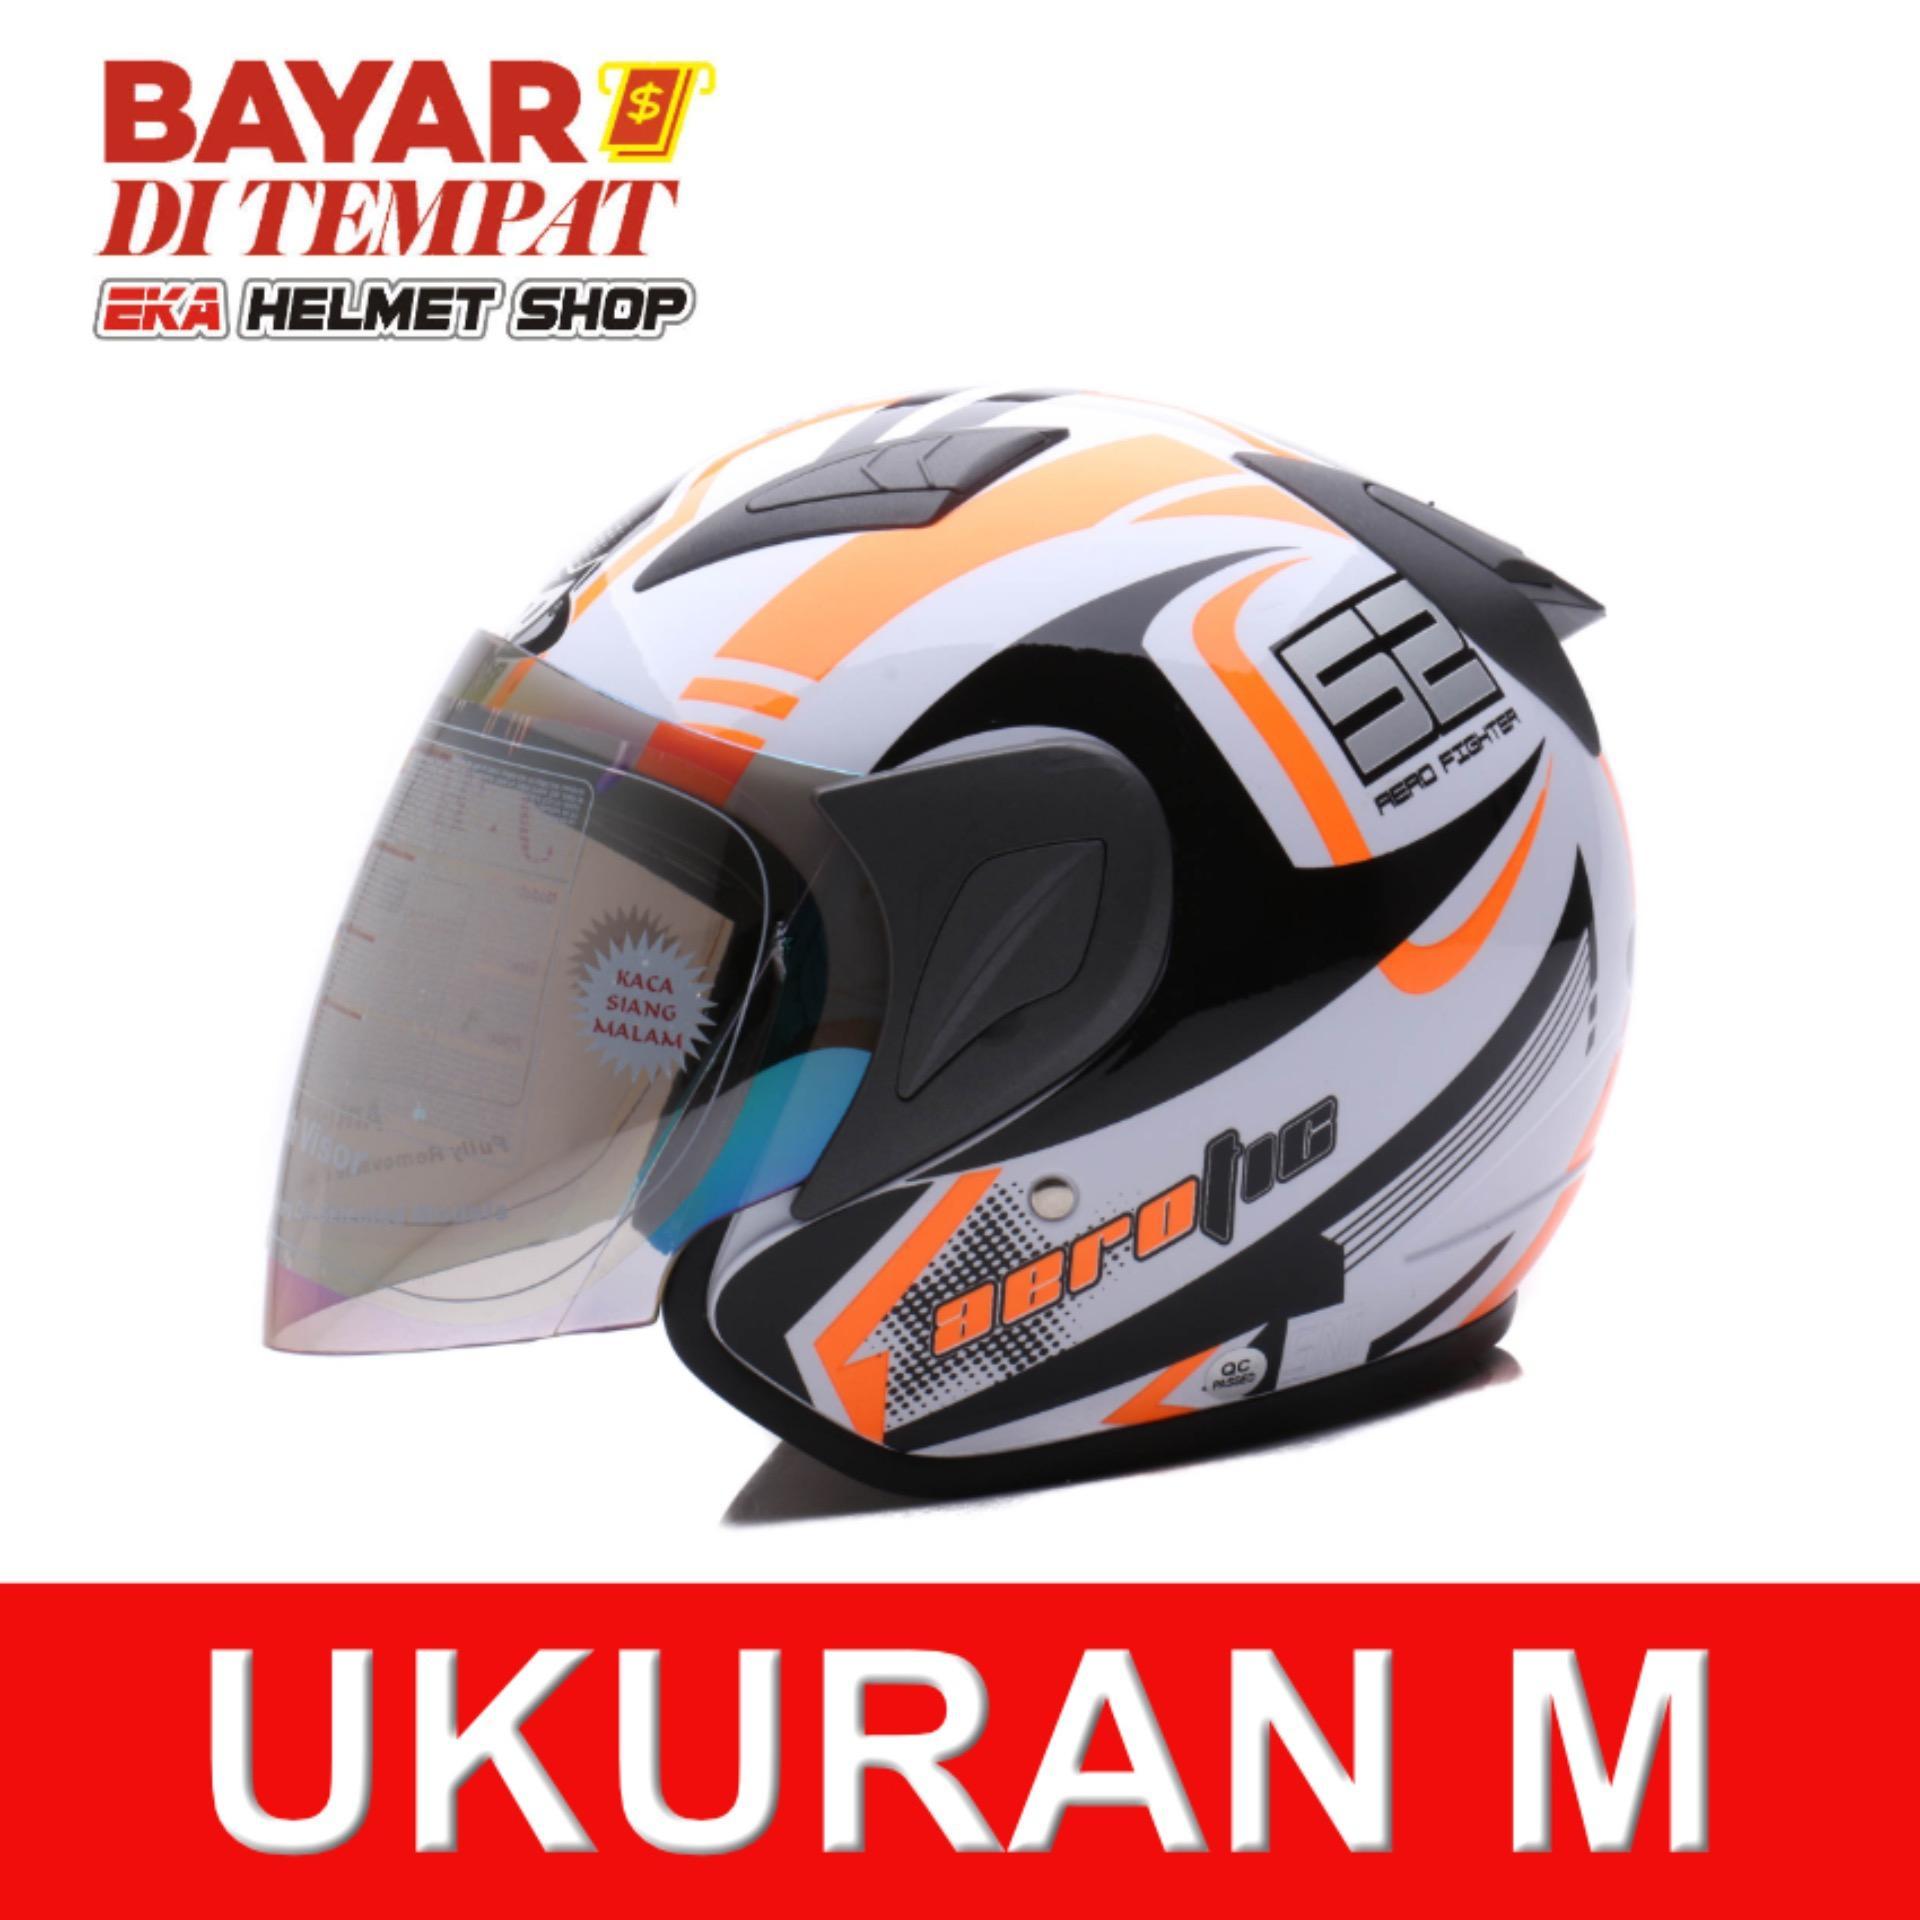 Top 10 Msr Helmet Javelin Aerotic Putih Hitam Oren Online